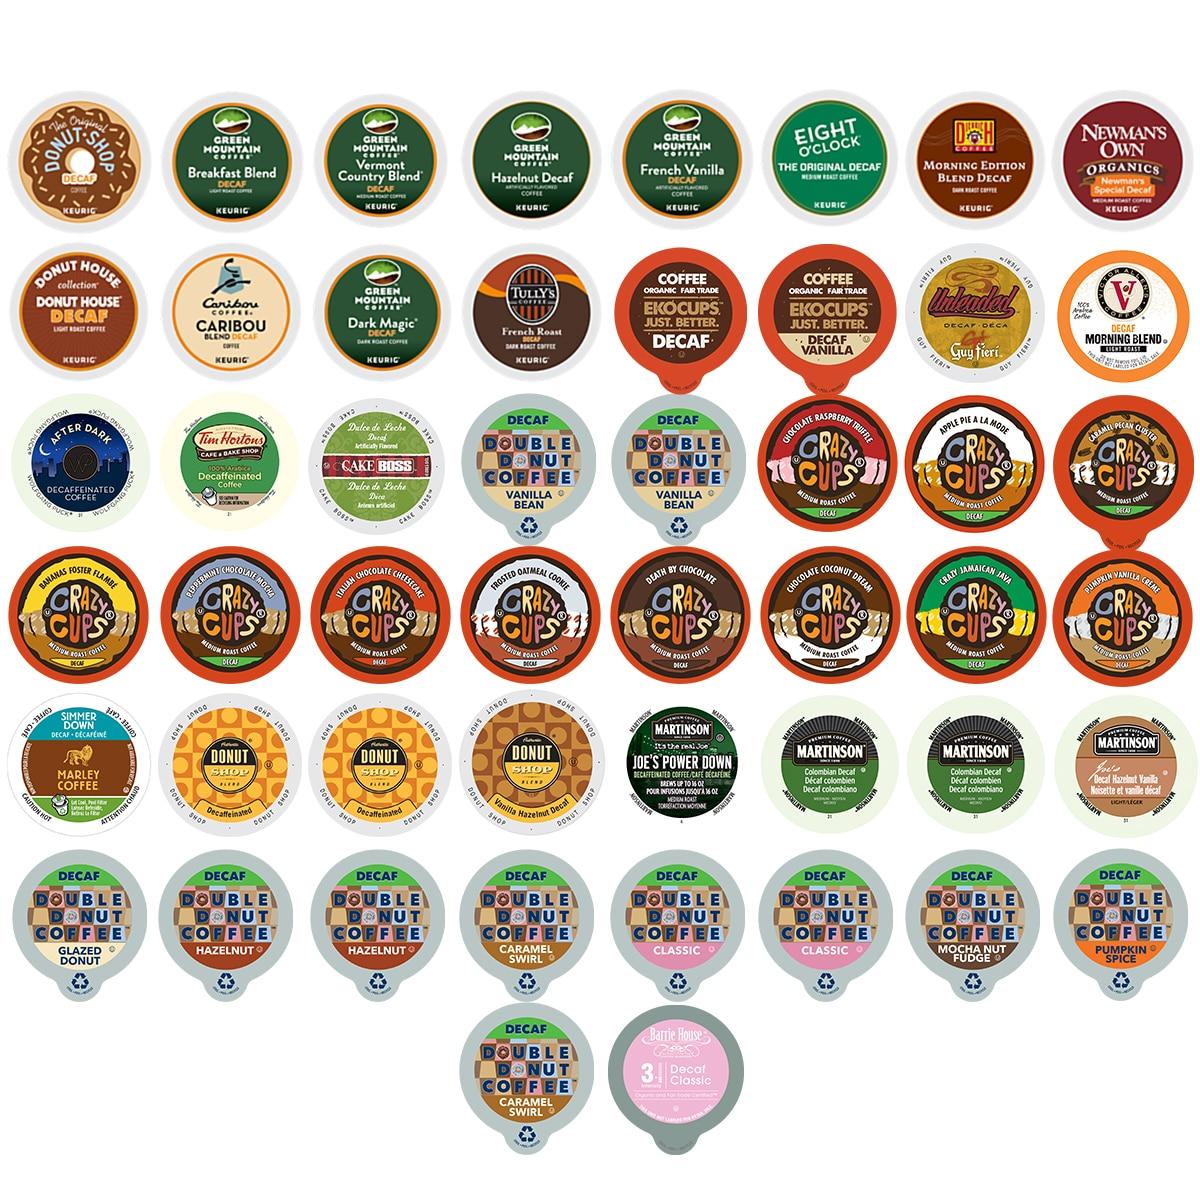 Decaf Coffee Single-serve Cups Variety Pack Sampler for Keurig K Cup Brewer (50 Count)